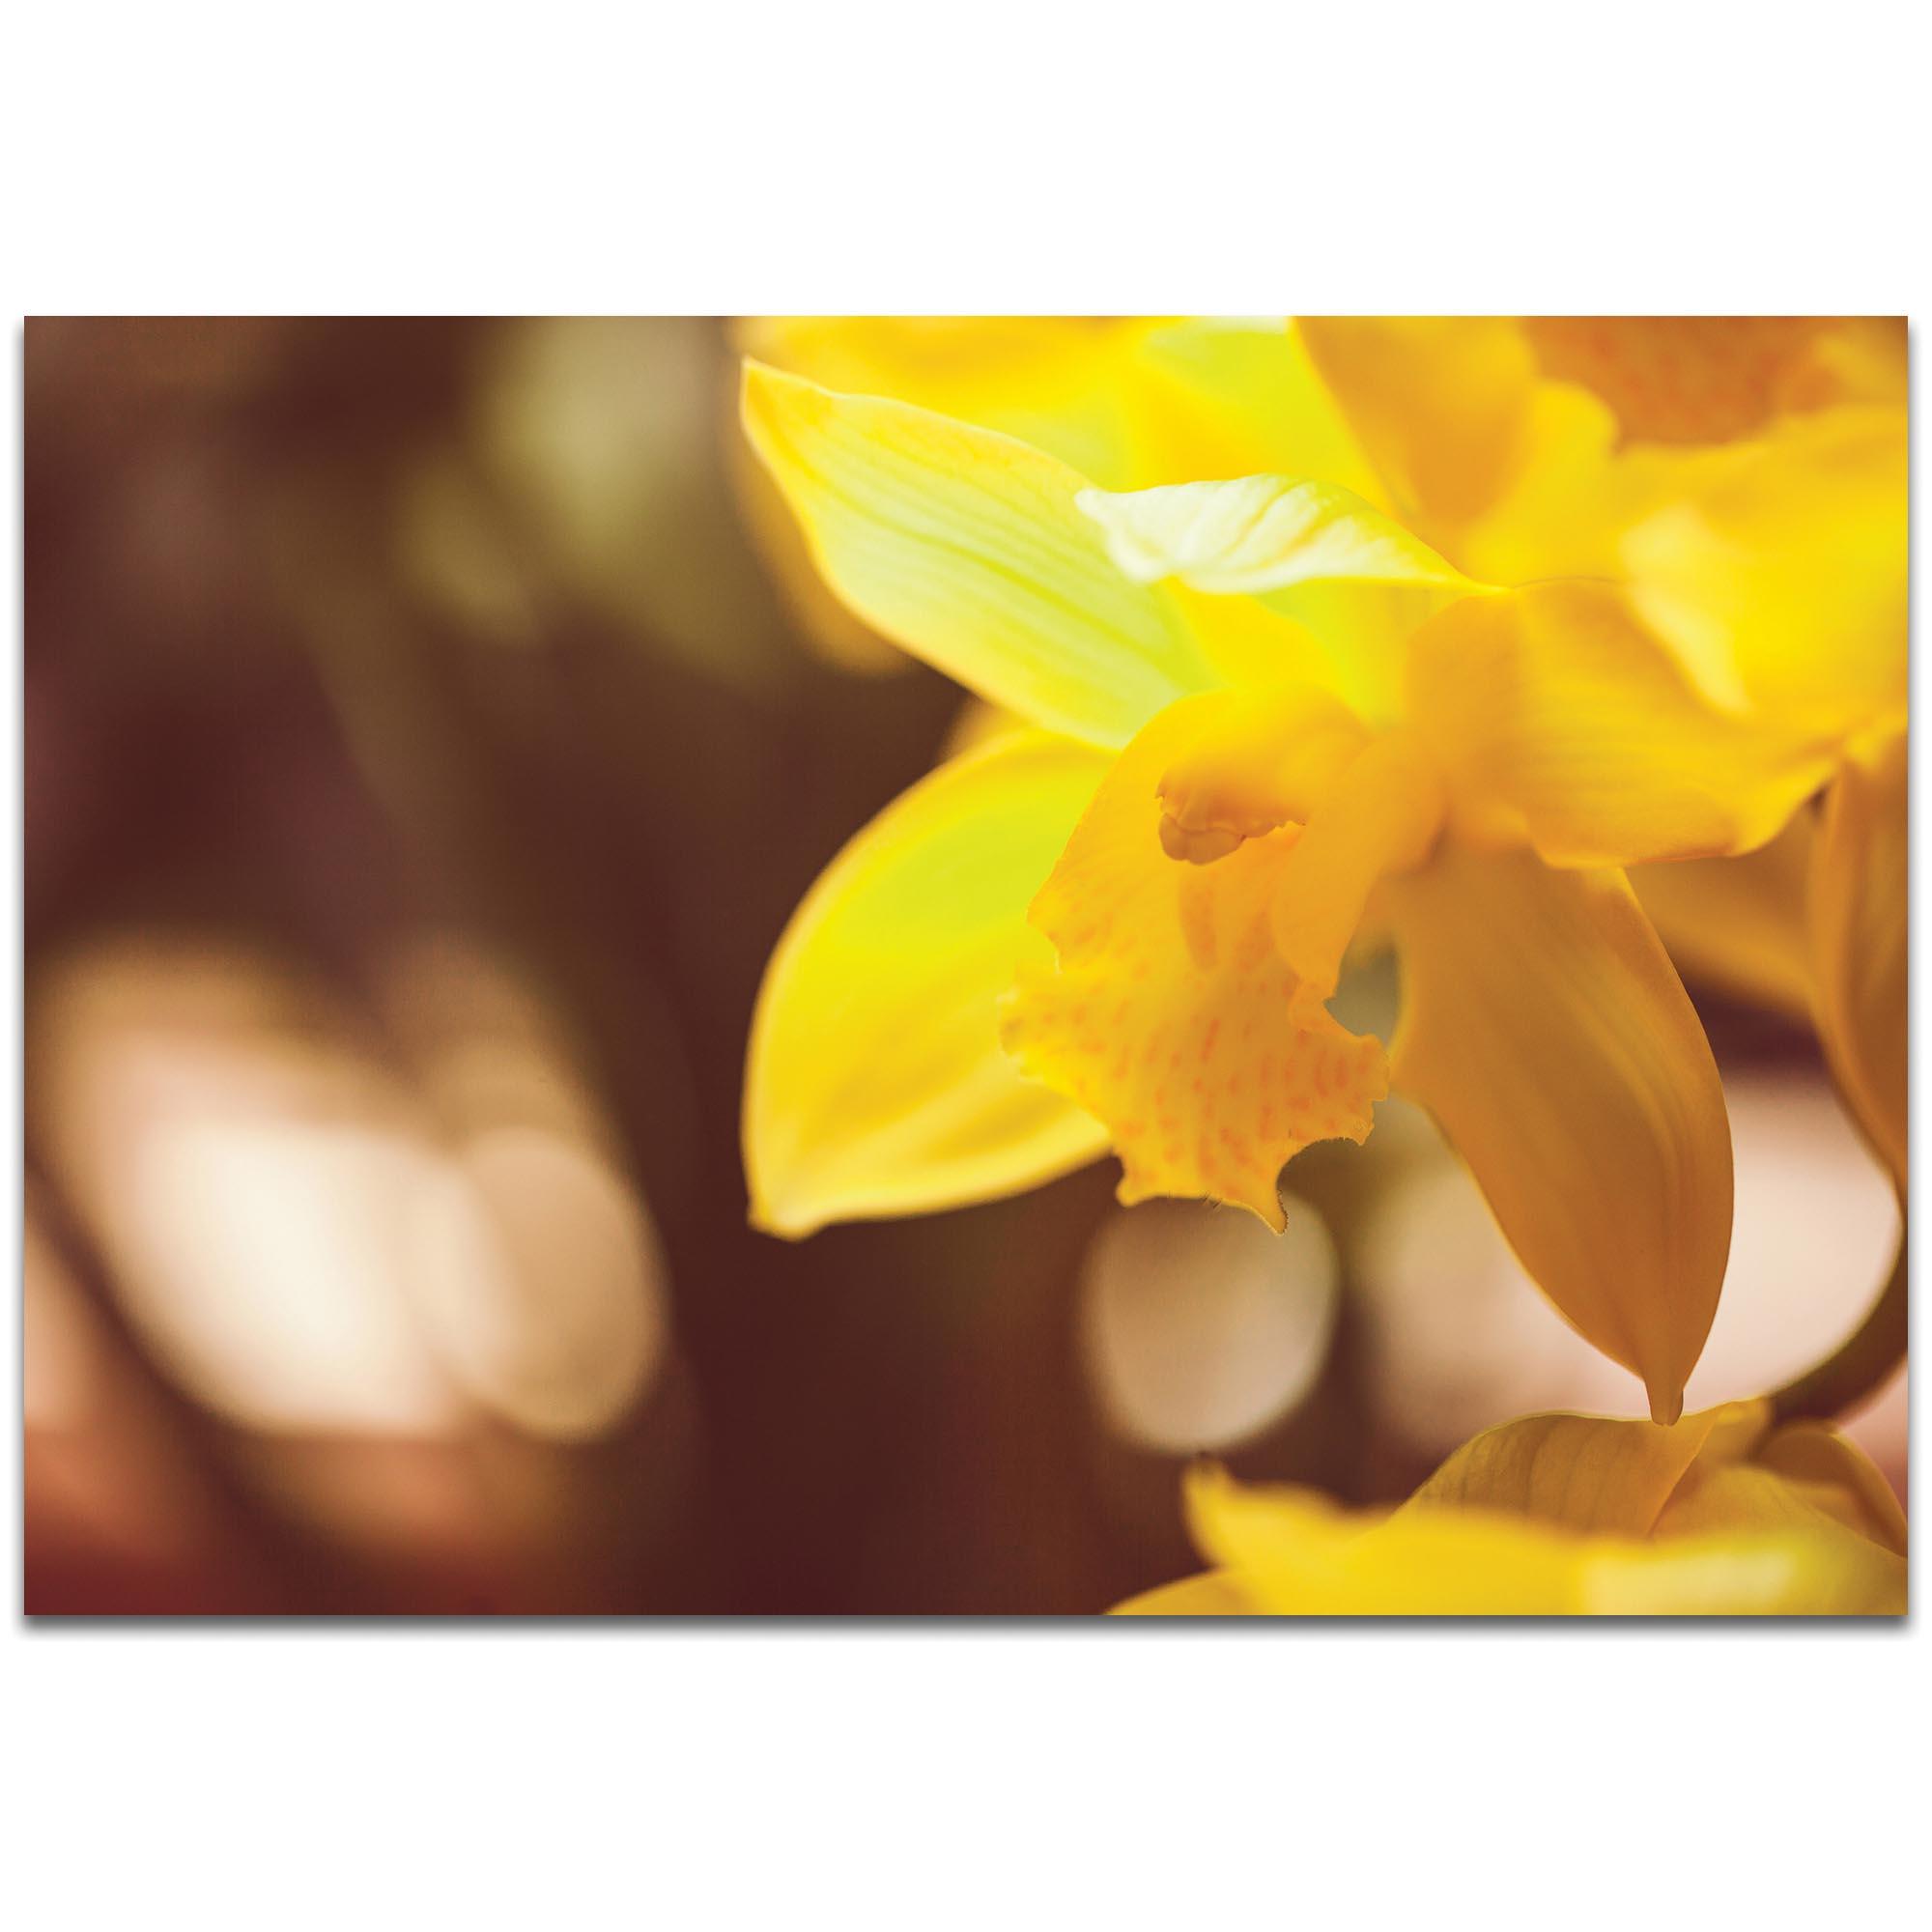 Nature Photography 'Golden Bloom' - Flower Blossom Art on Metal or Plexiglass